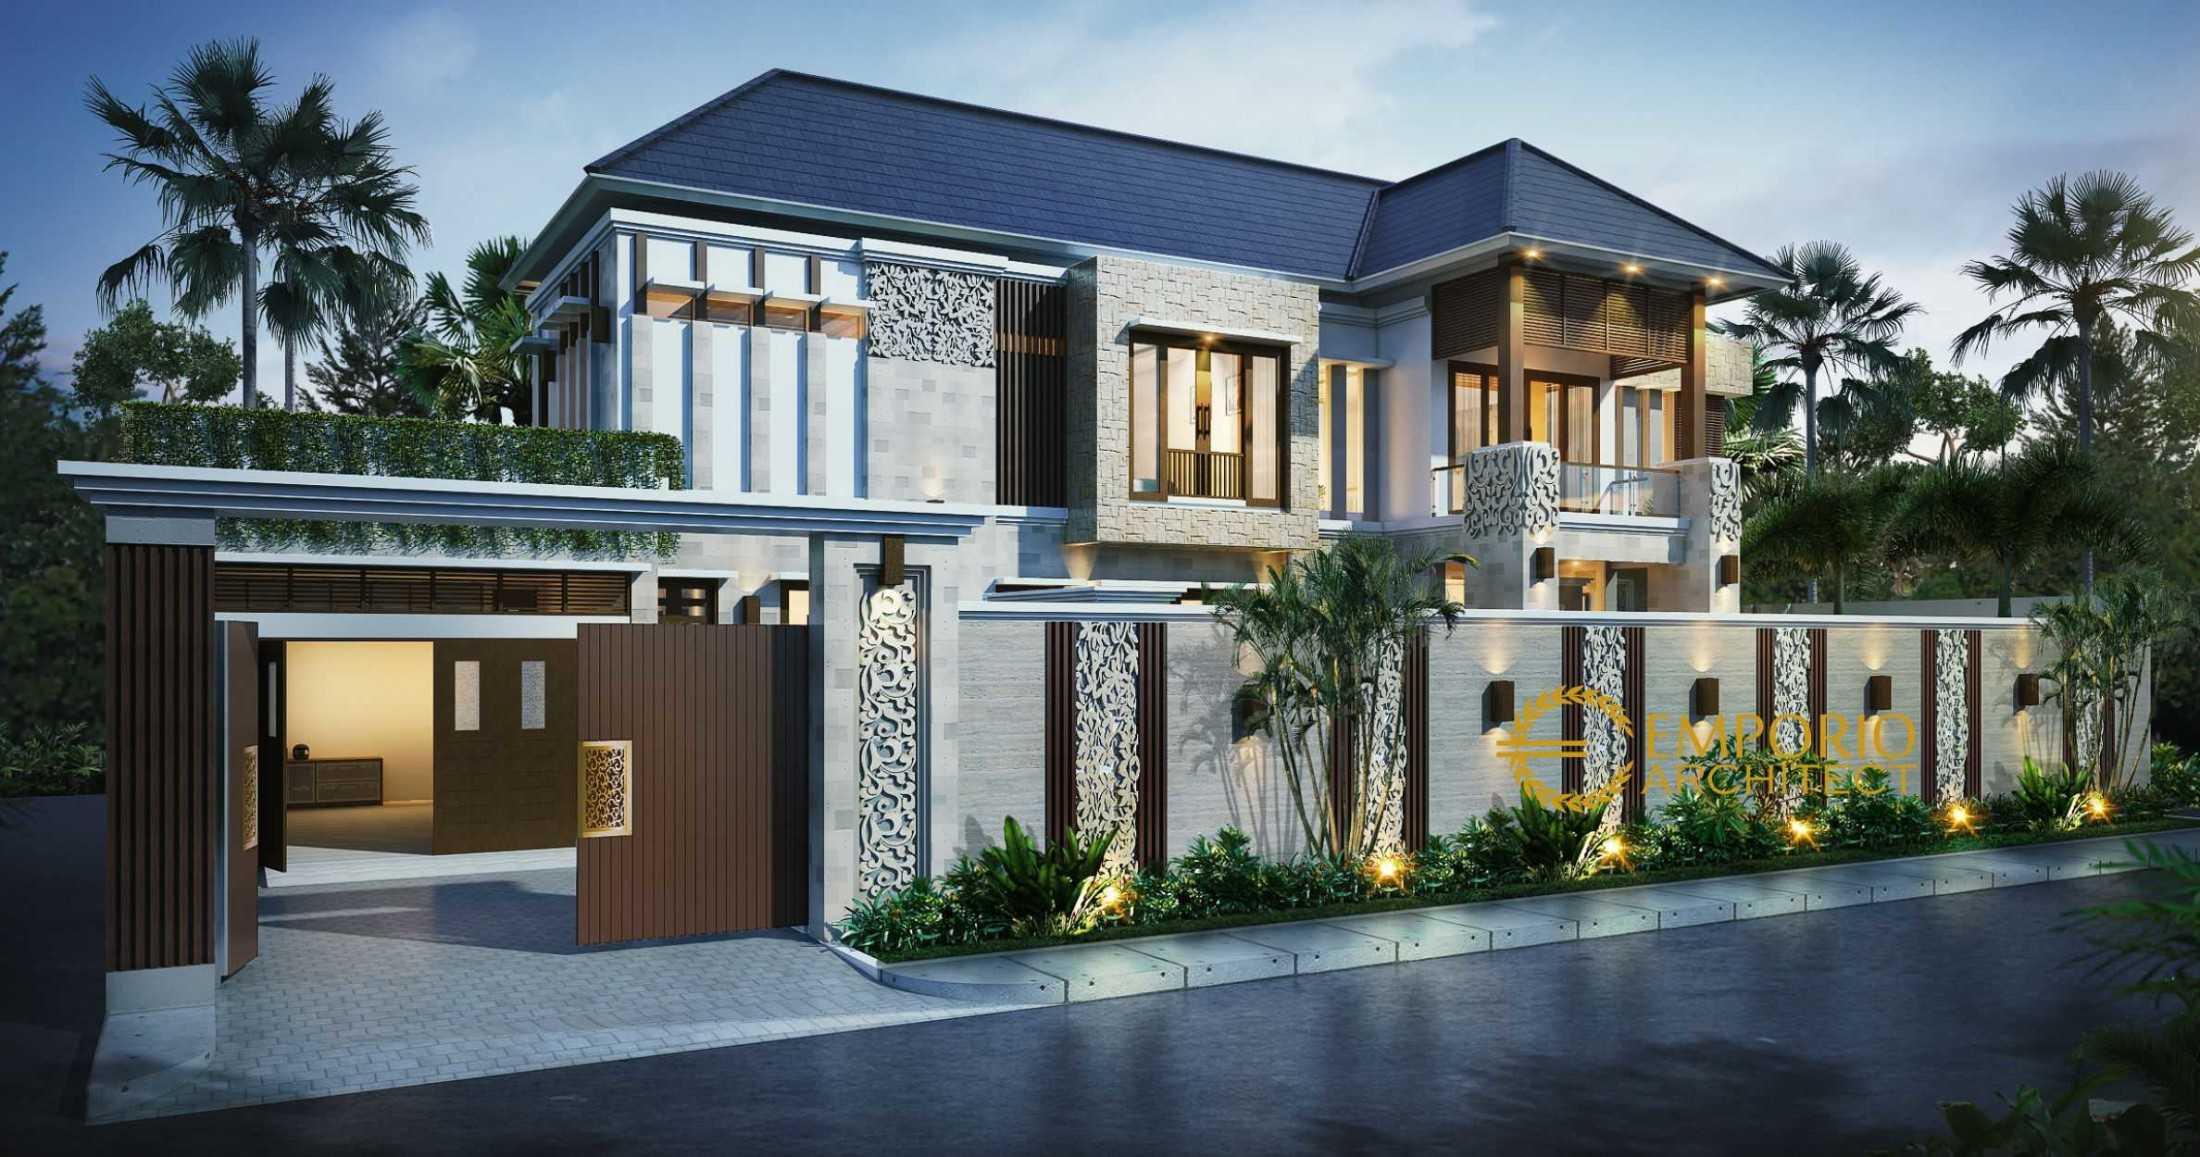 Emporio Architect Jasa Arsitek Jawa Timur Desain Rumah Villa Bali Tropis 247 @ Probolinggo, Jawa Timur Probolinggo, Kota Probolinggo, Jawa Timur, Indonesia Probolinggo, Kota Probolinggo, Jawa Timur, Indonesia Emporio-Architect-Jasa-Arsitek-Jawa-Timur-Desain-Rumah-Villa-Bali-Tropis-247-Probolinggo-Jawa-Timur Tropical 84419